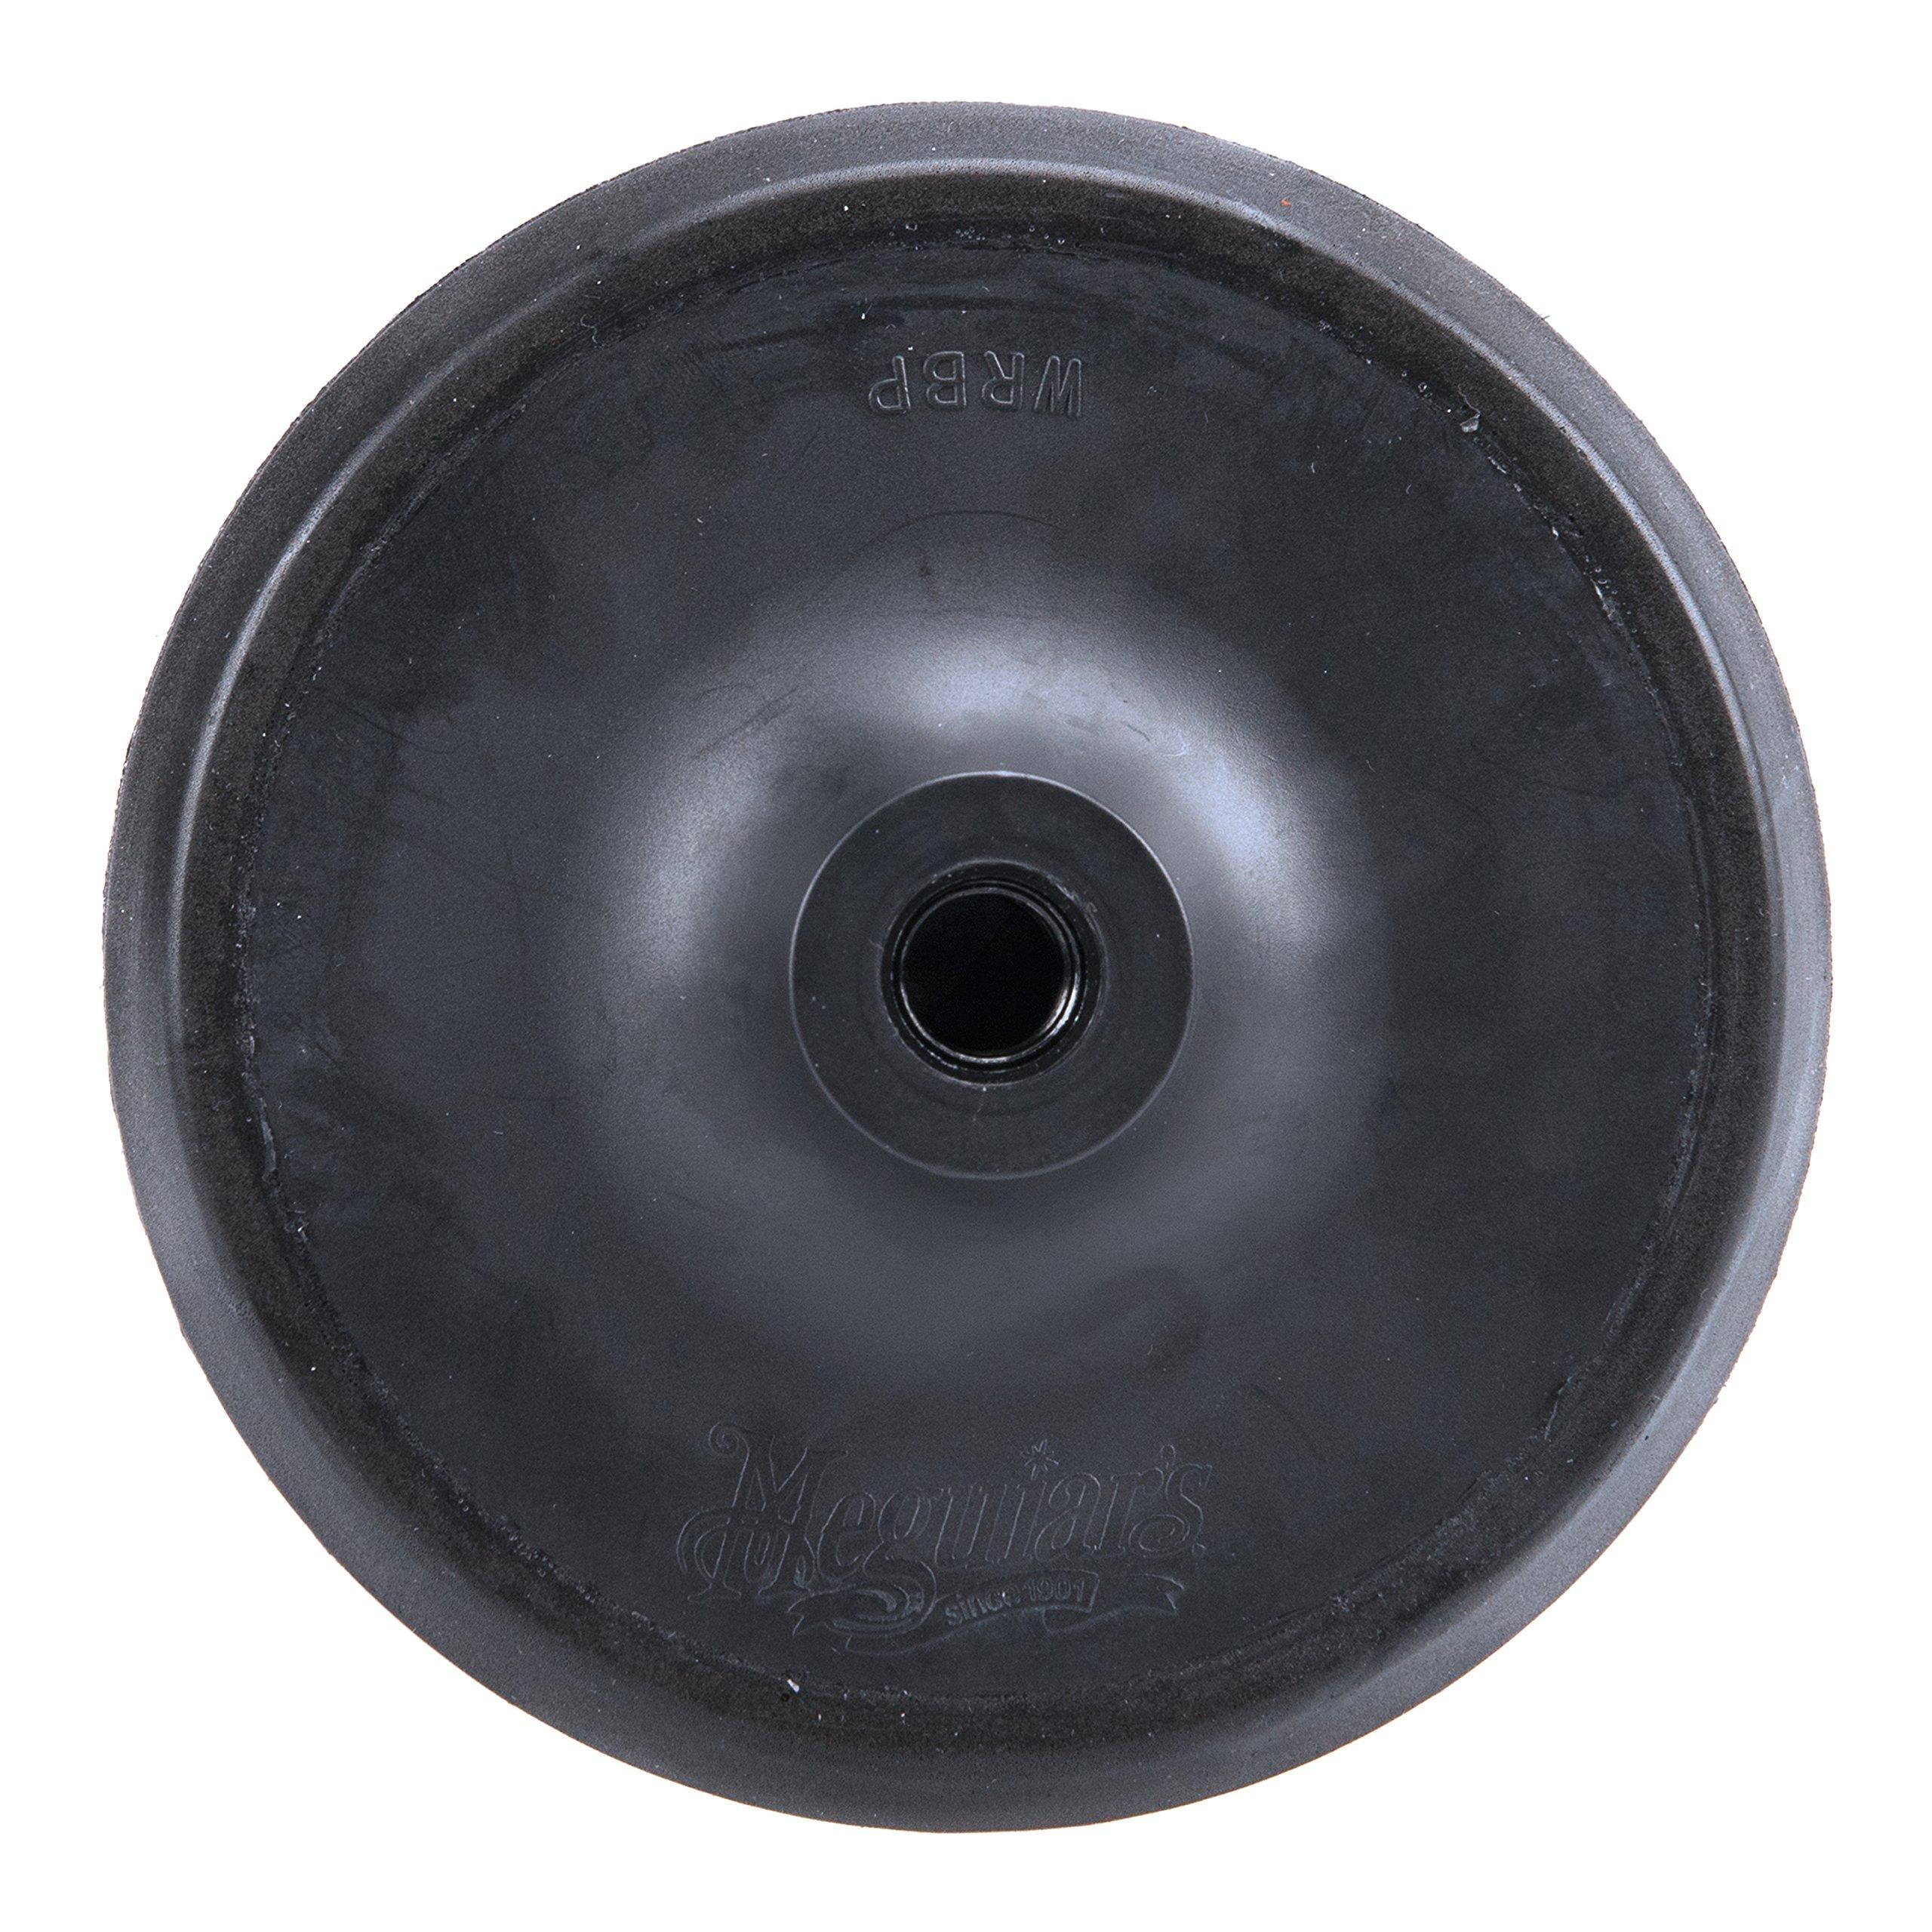 Meguiar's WRBP Rotary Backing Plate